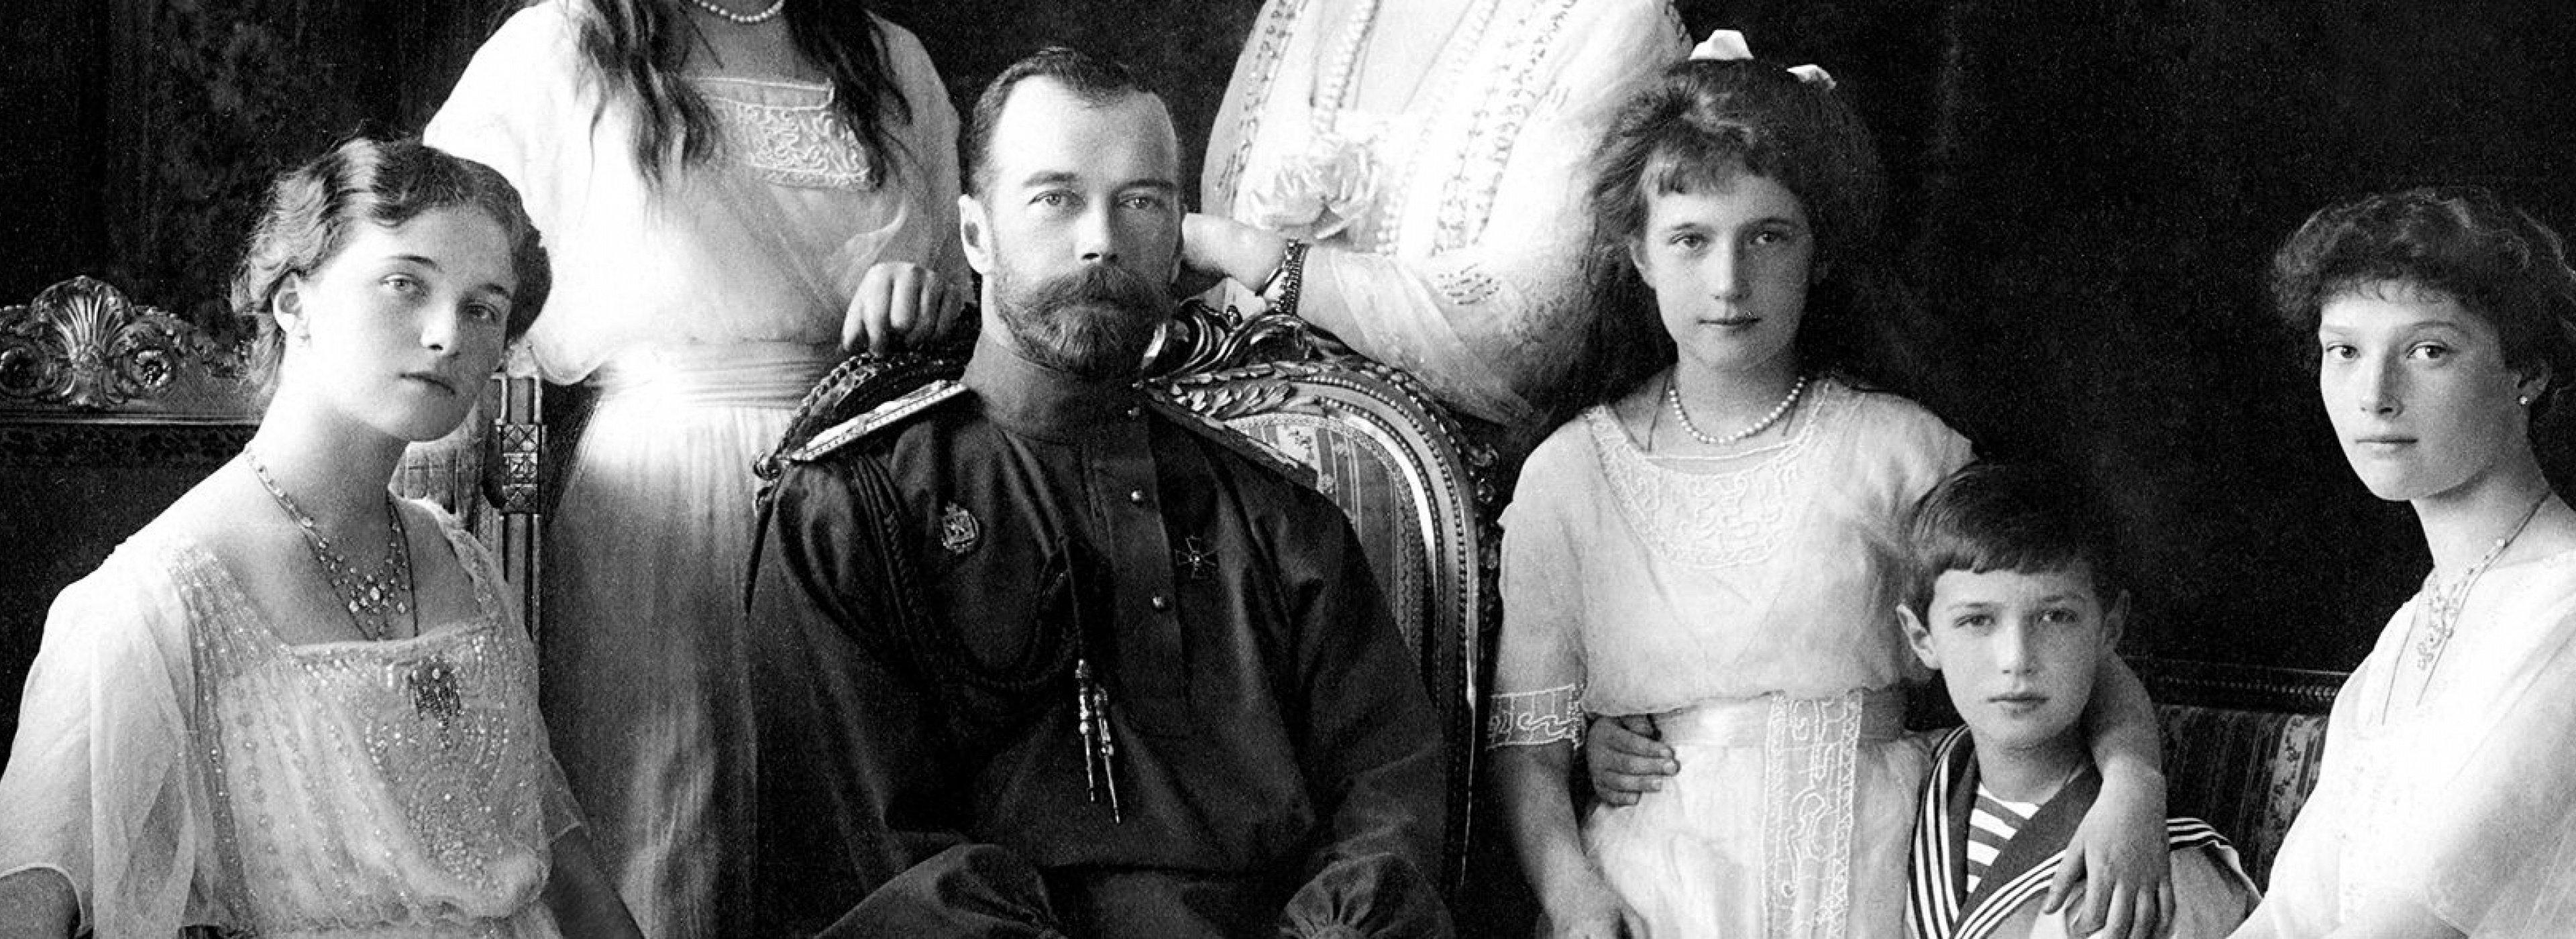 The Romanovs Imperial Family